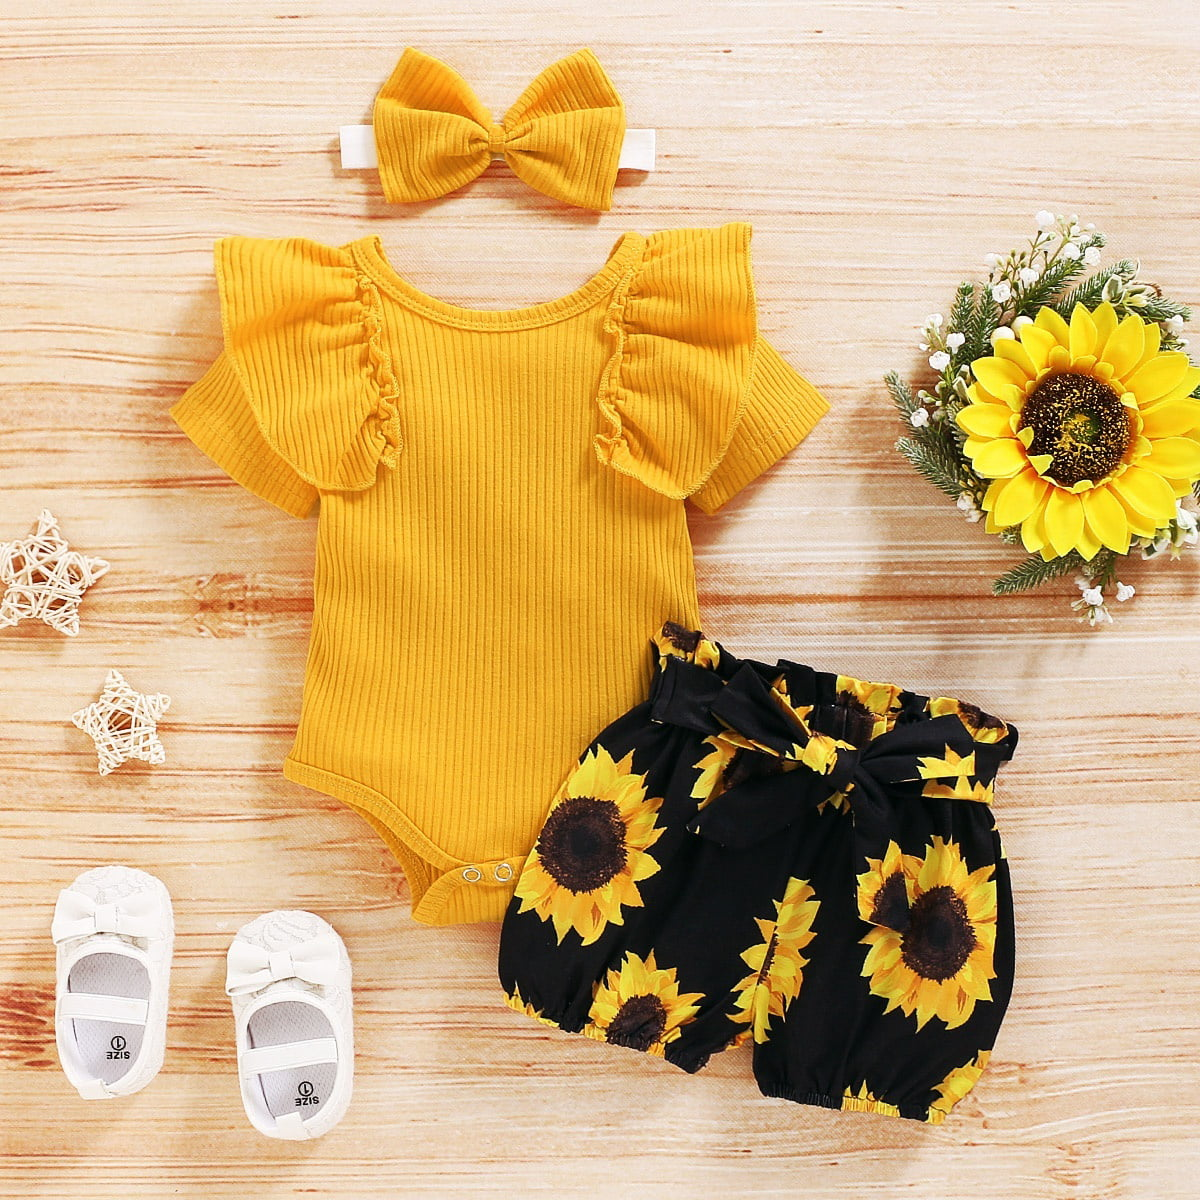 Newborn Baby Girls Short Sleeve Sunflower Print Jumpsuit+Headband Outfits Sets